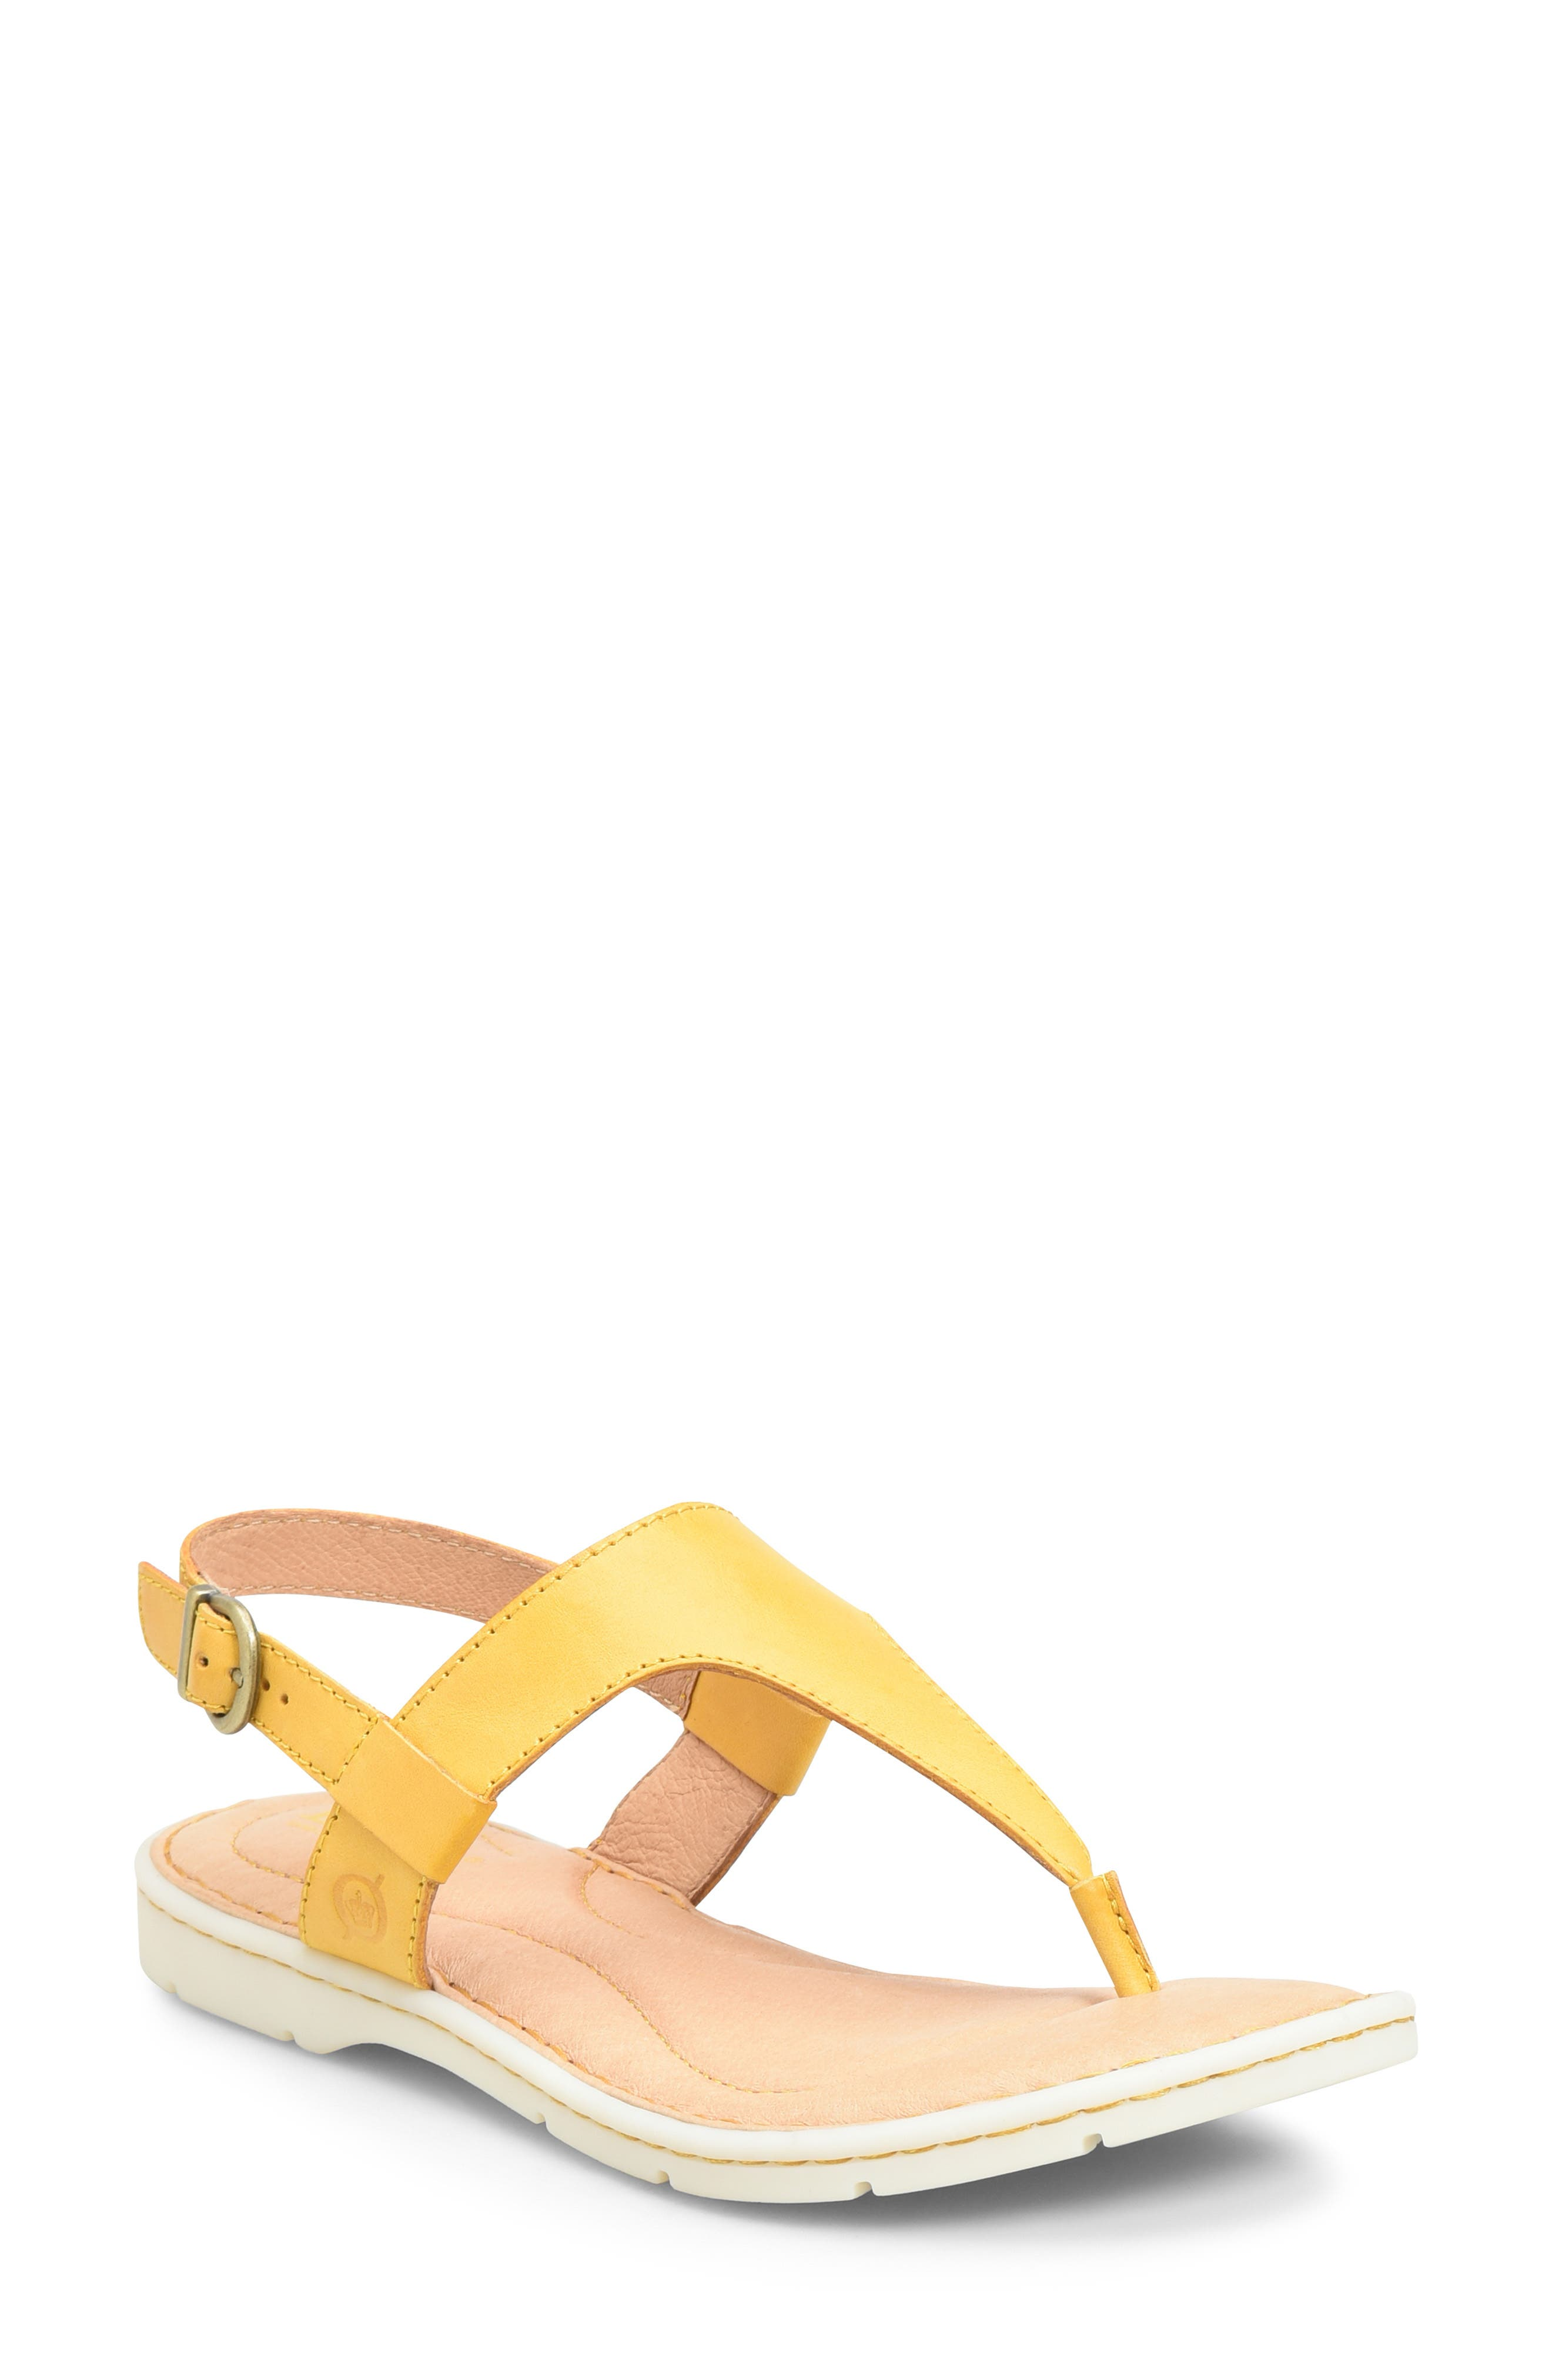 B?rn Taylor V-Strap Sandal, Yellow